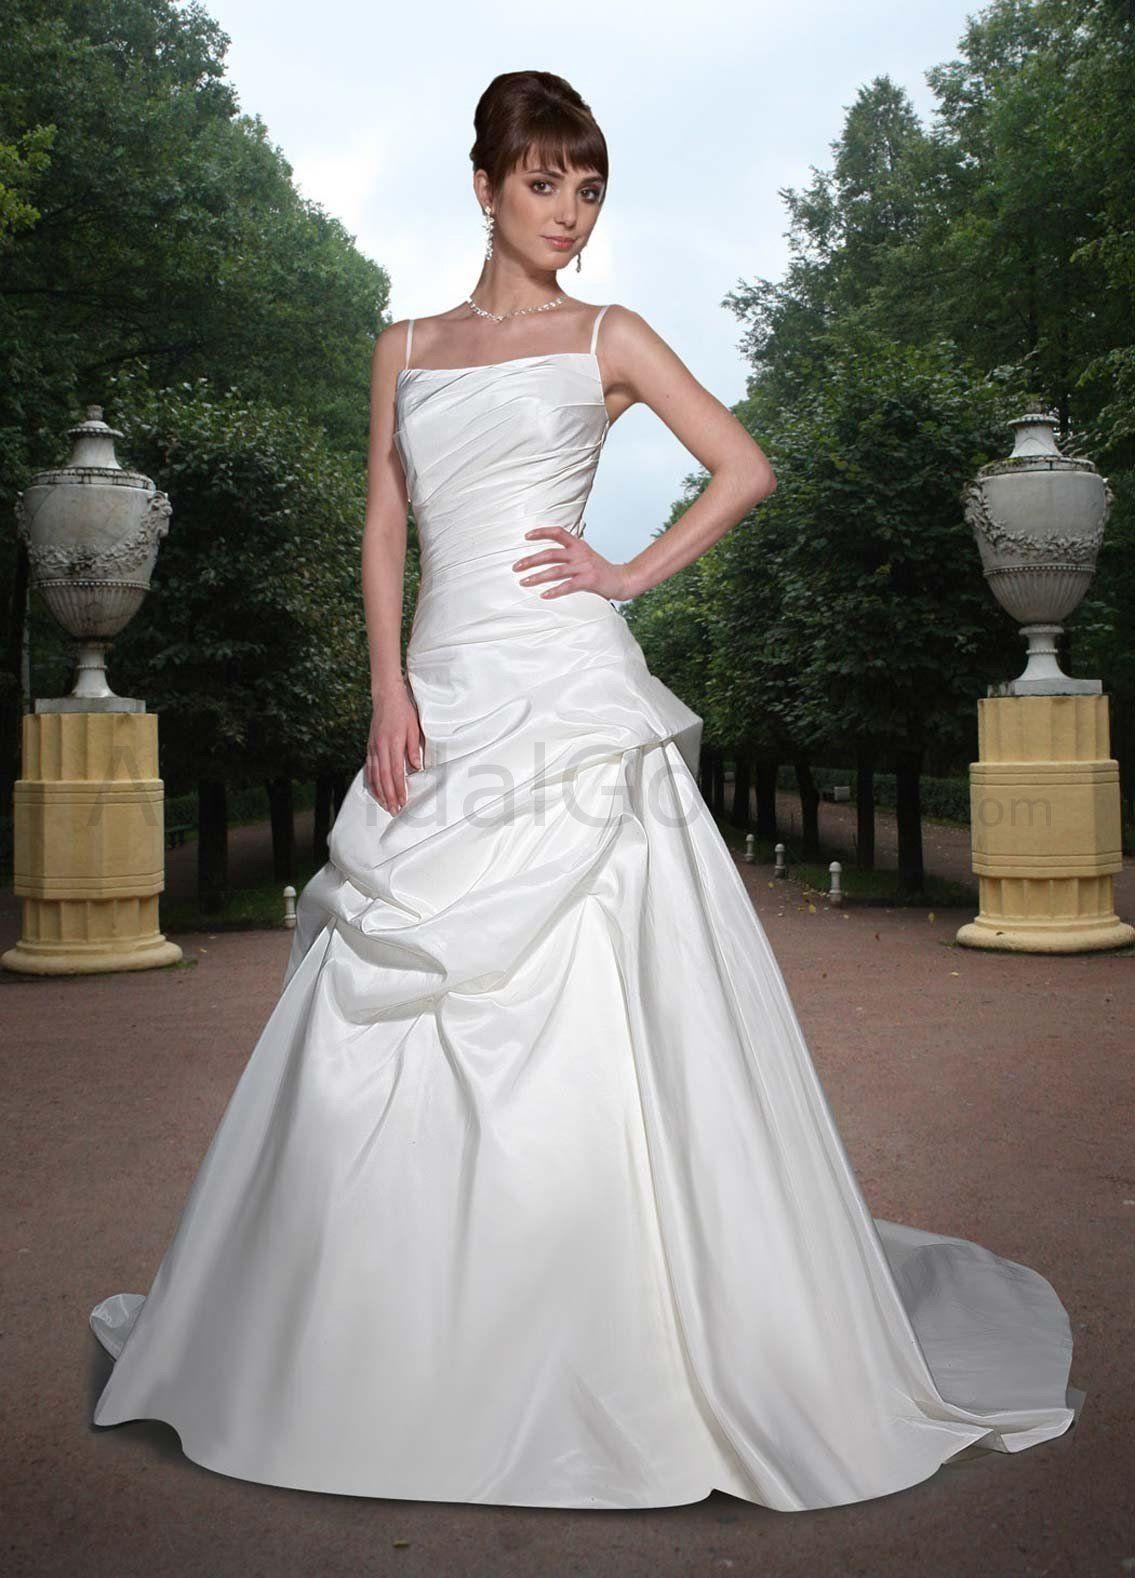 Satin aline square neckline rouched bodic wedding dress wedding